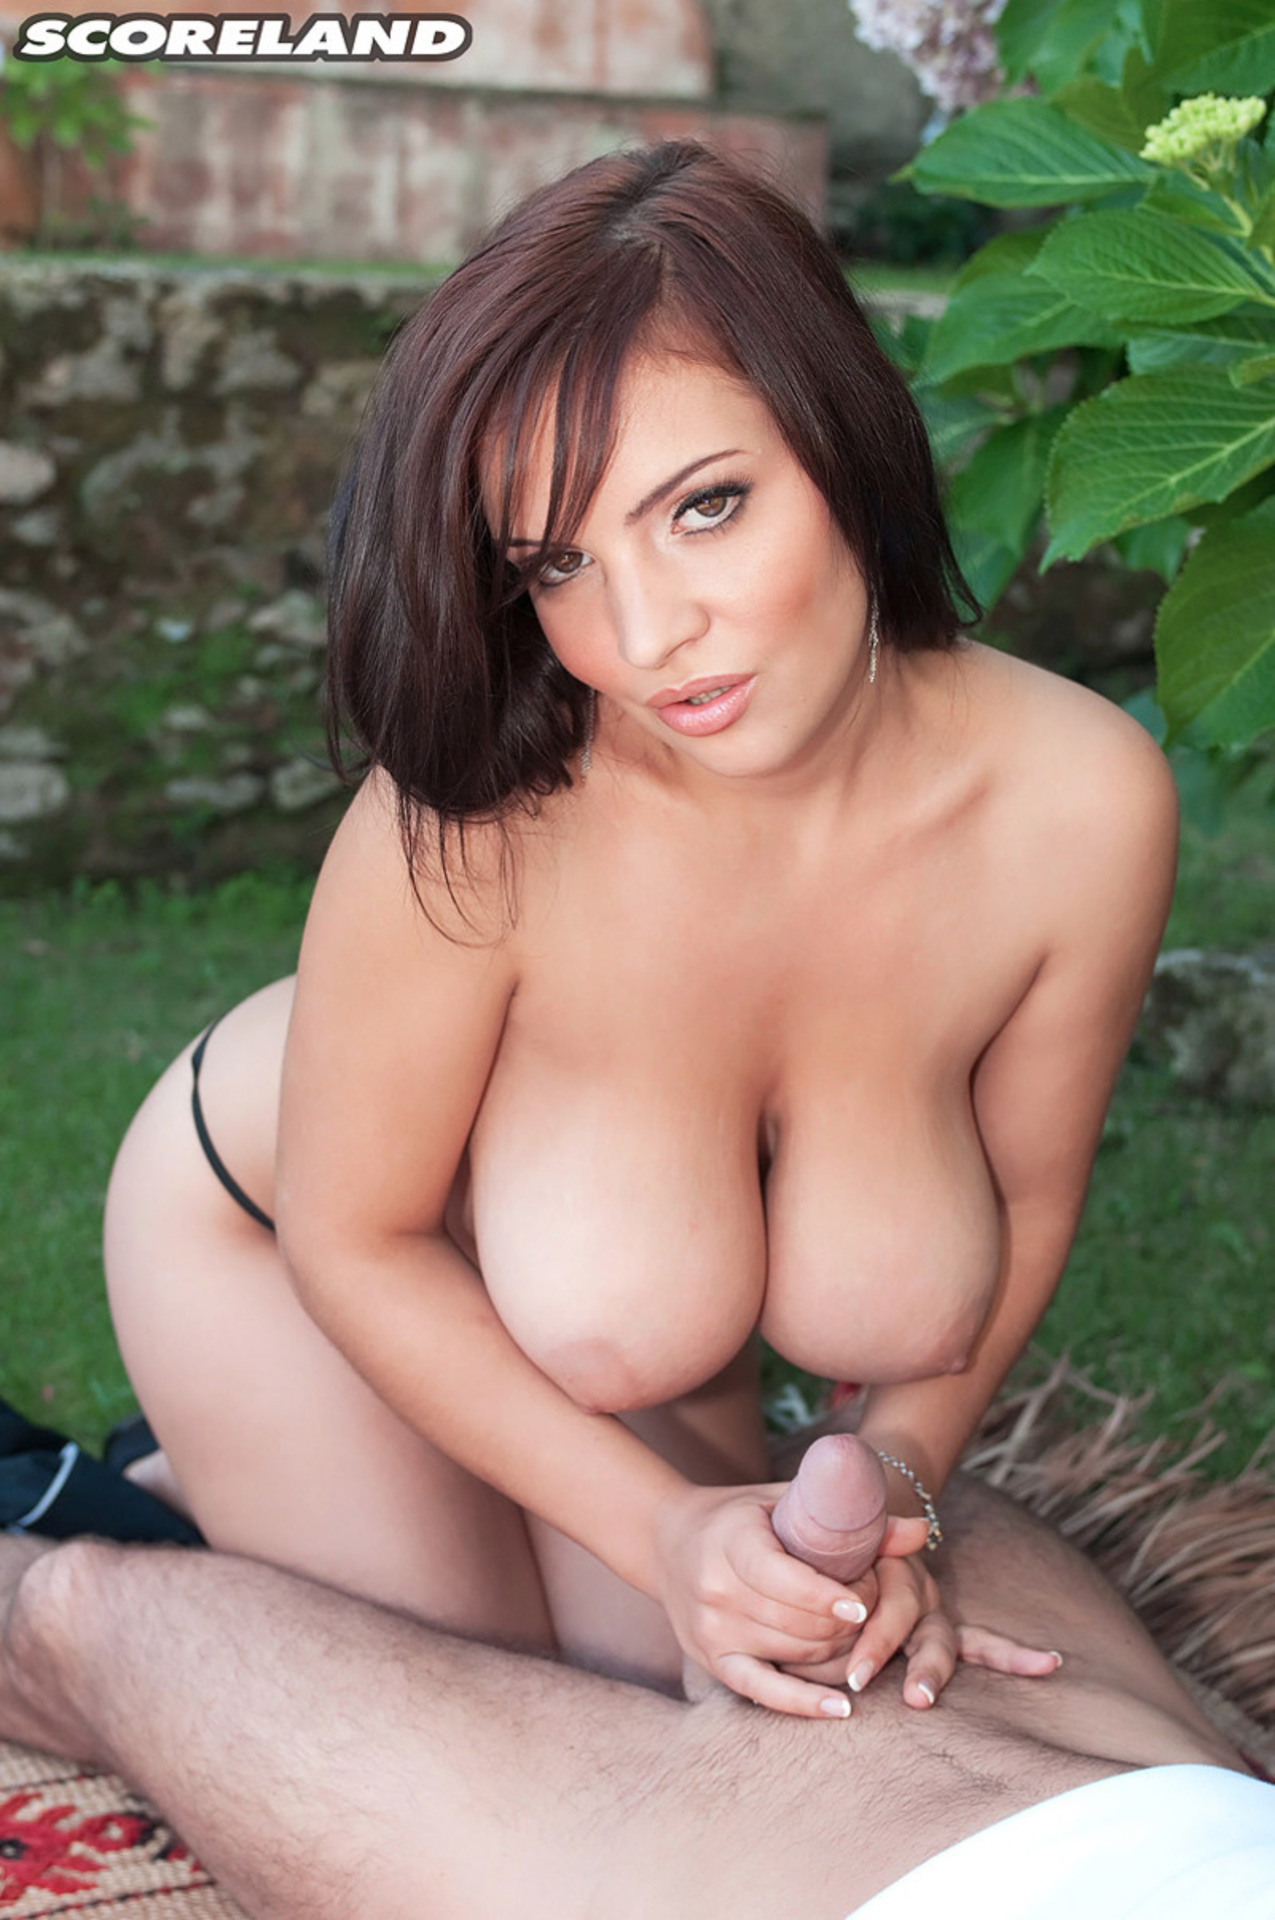 Hot Assed Lizzy Bennett